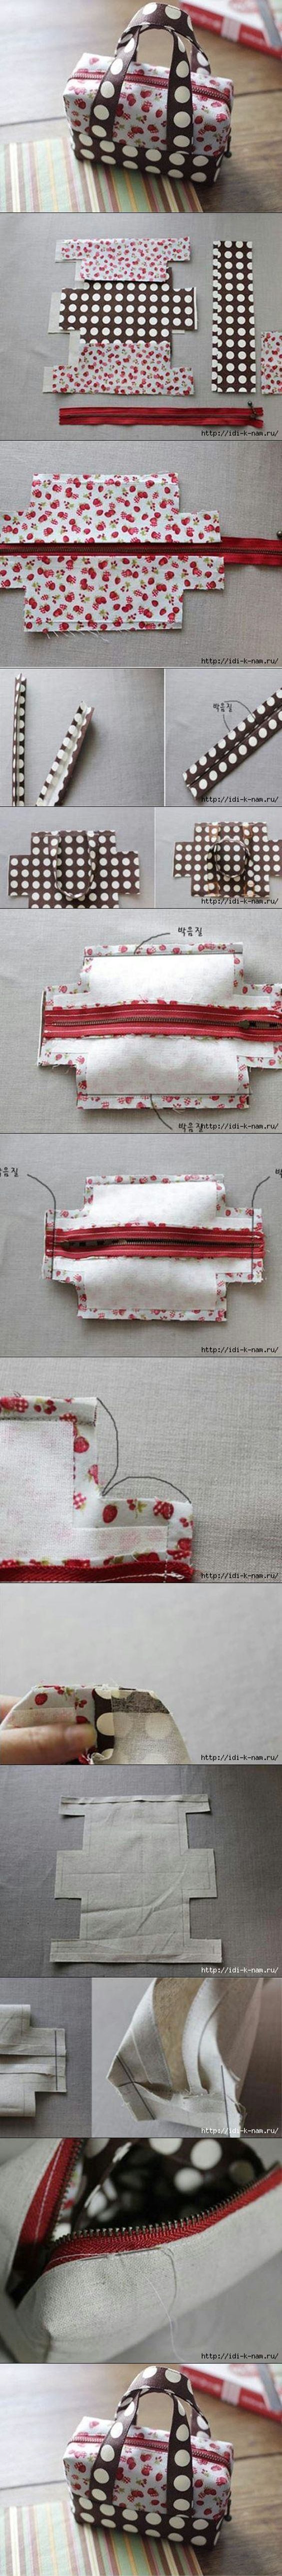 DIY Fabric Mini Tote | www.FabArtDIY.com LIKE Us on Facebook ==> https://www.facebook.com/FabArtDIY: